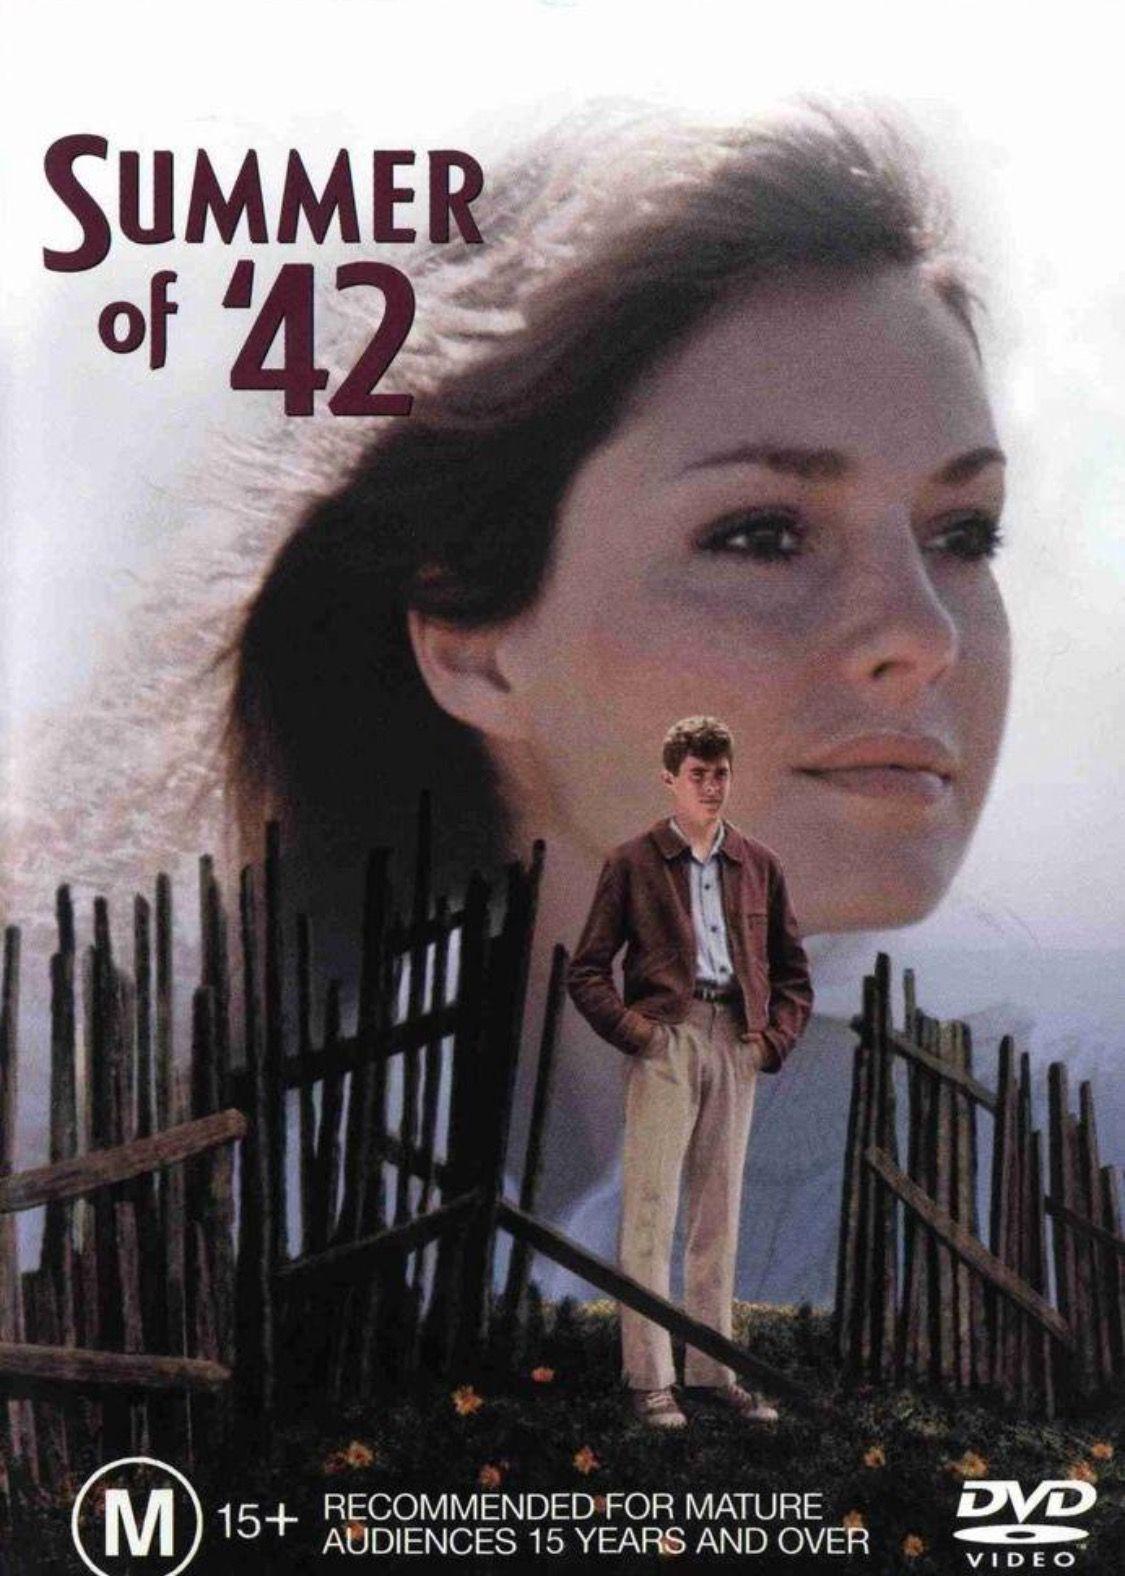 Summer Of 42 Great Movie Remember It Well 42 Movie Jennifer O Neill Summer